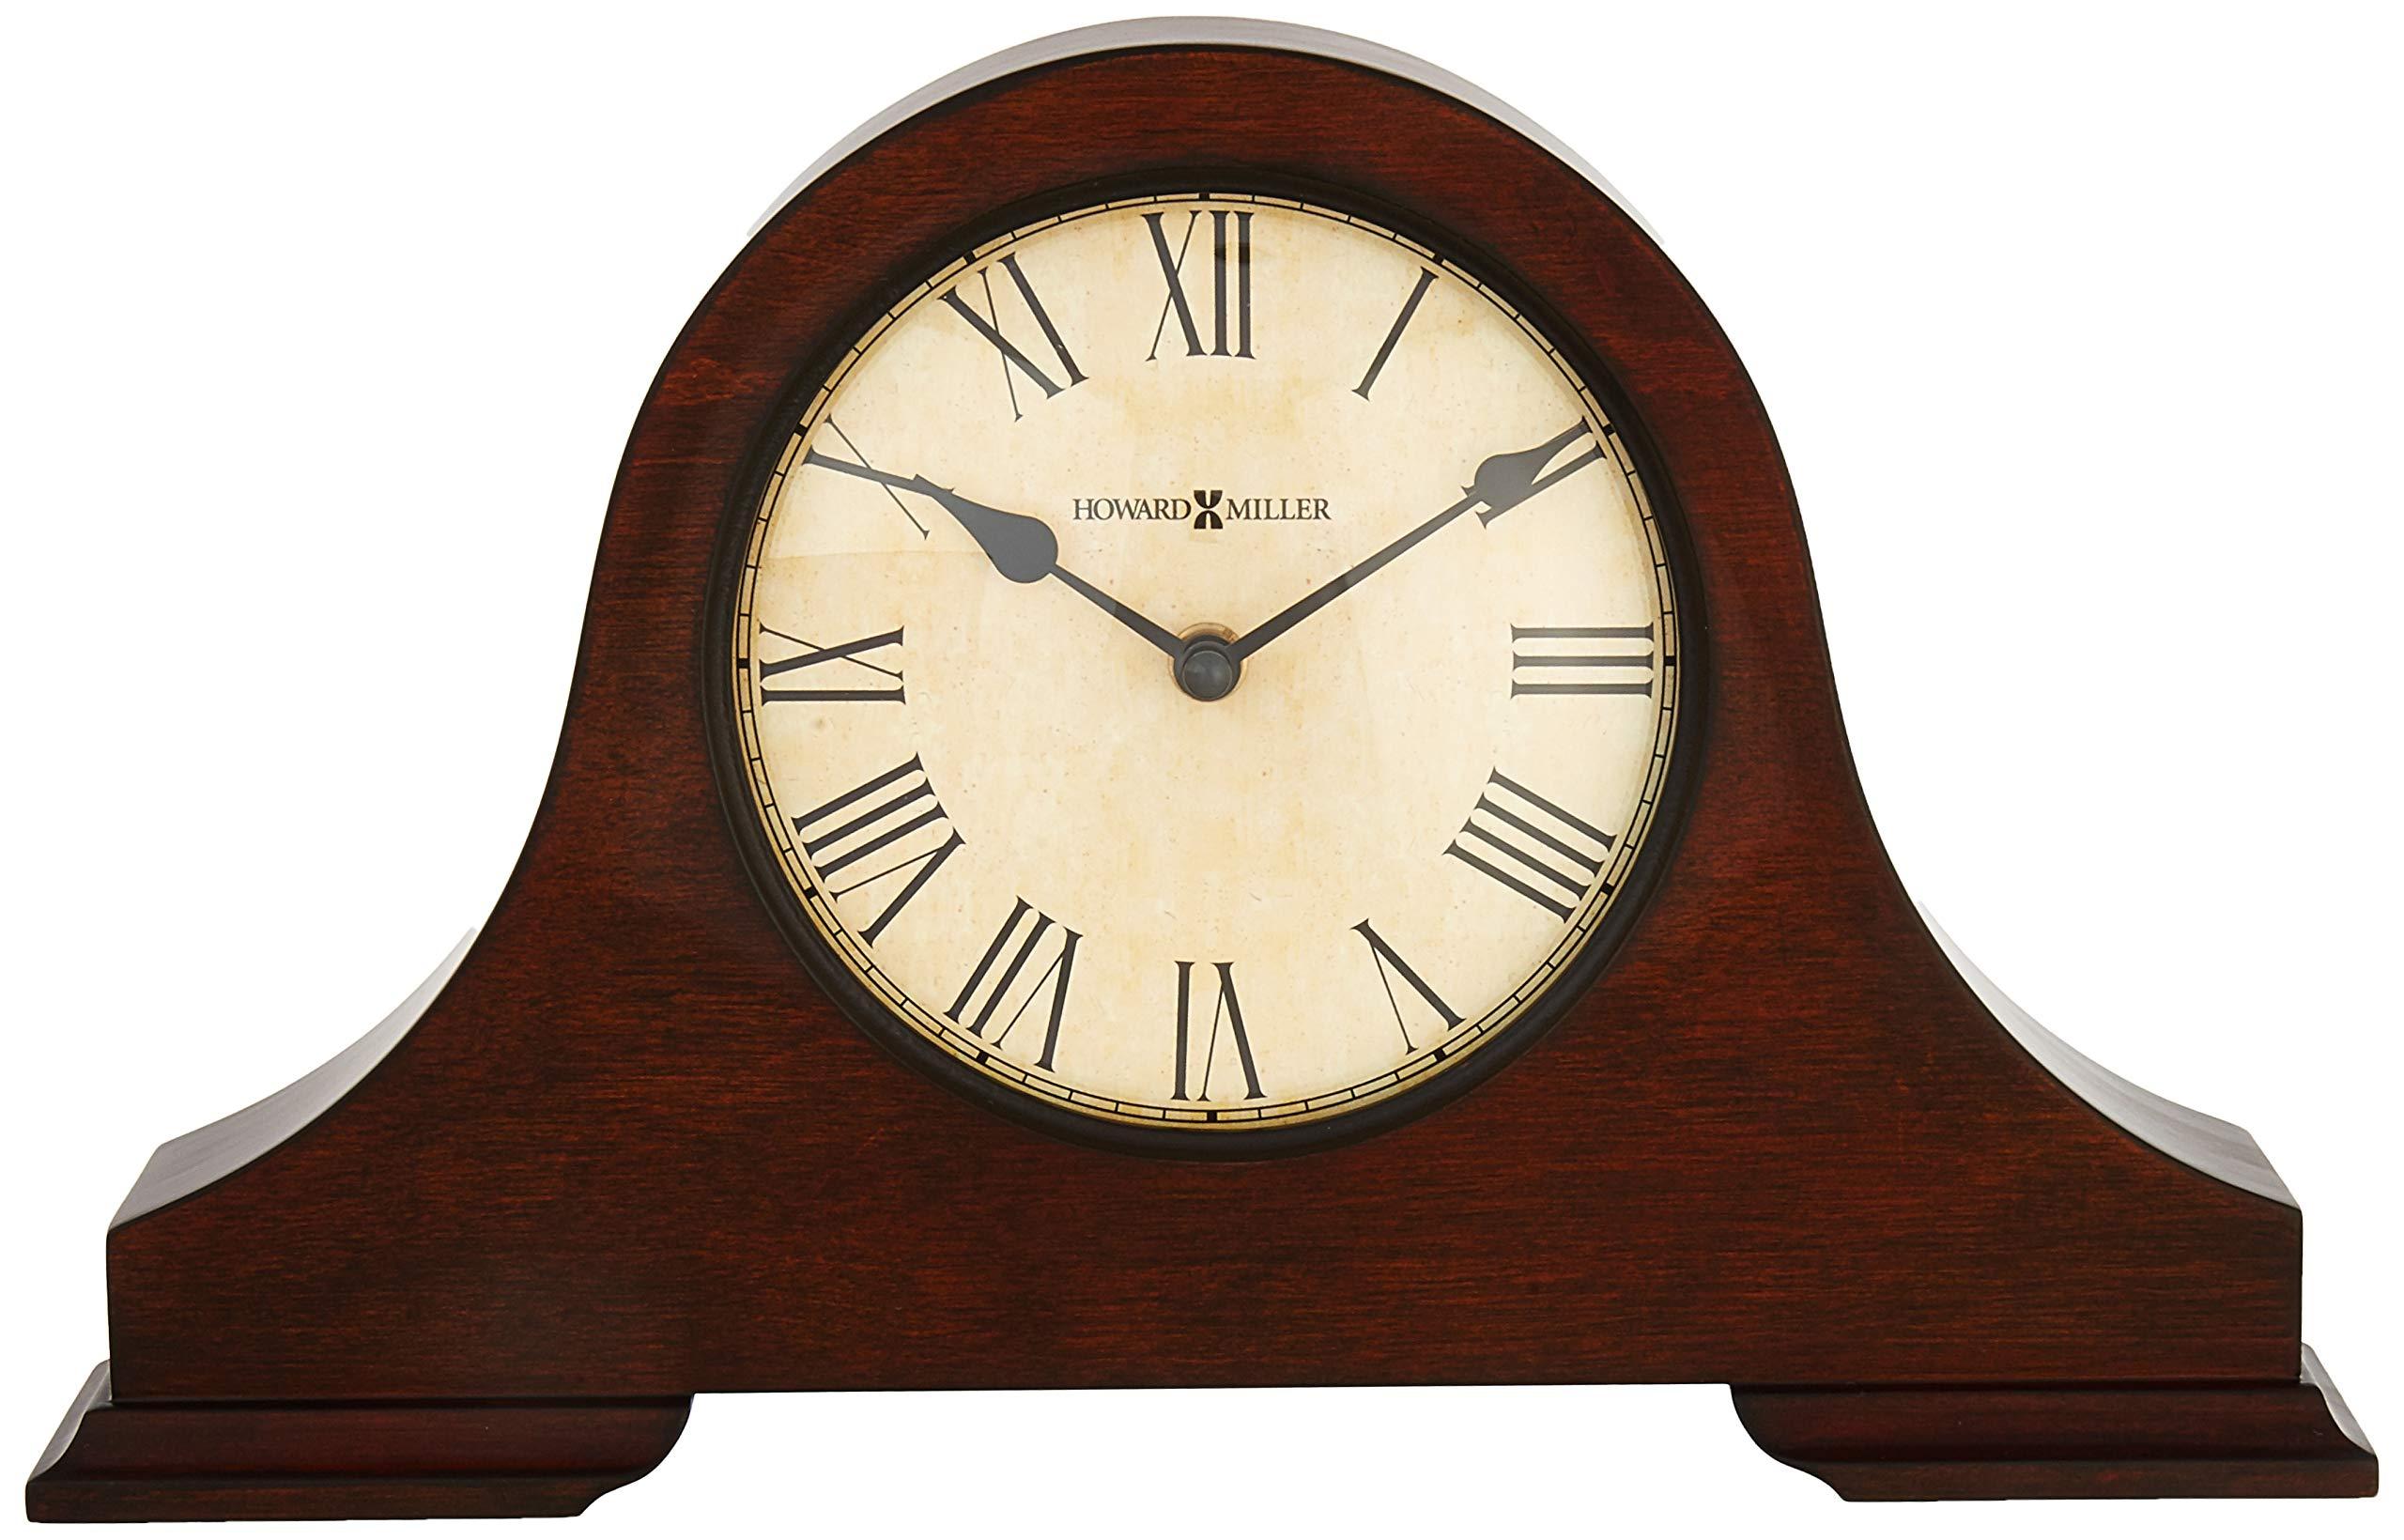 Howard Miller 635-143 Humphrey Mantel Clock by Howard Miller